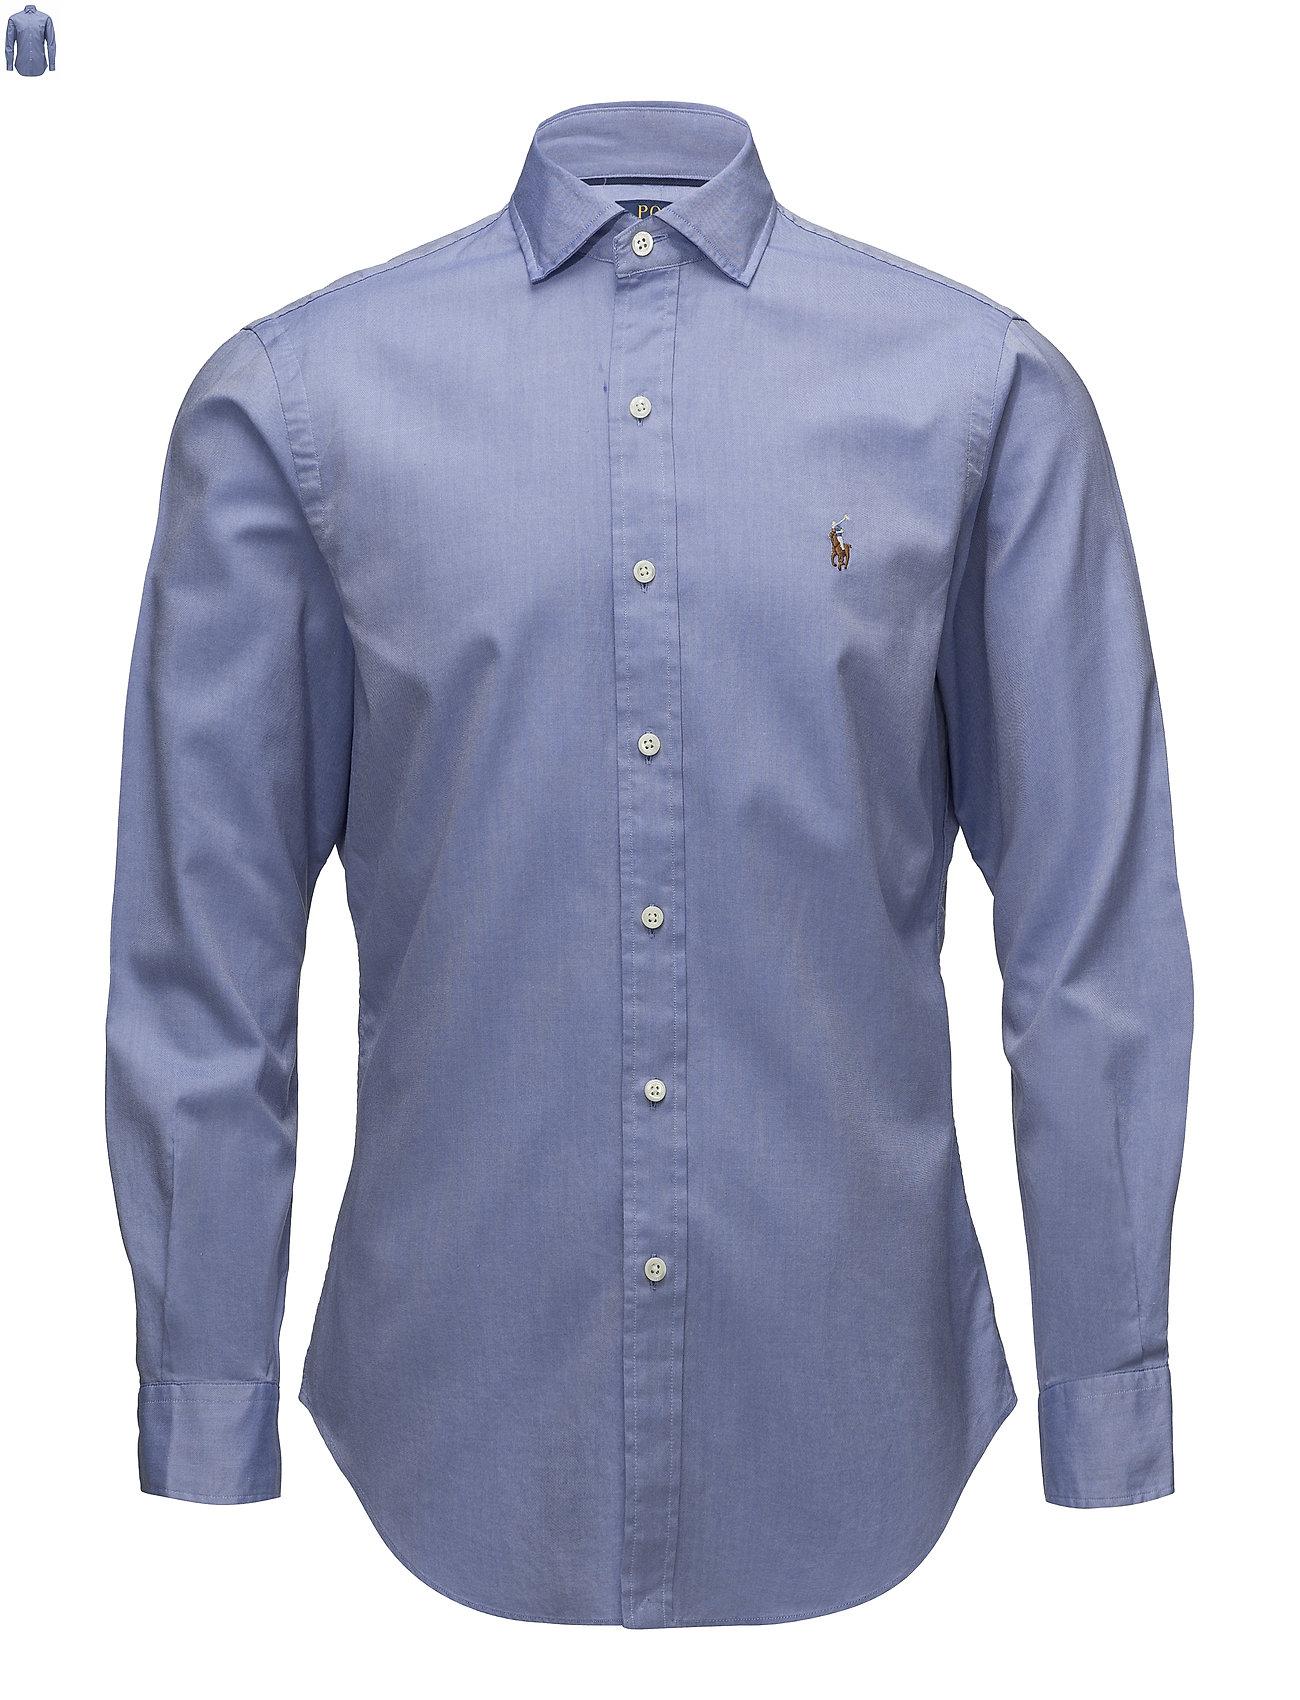 24038a1e5d22 Slim Fit Oxford Shirt (2558a Blue white) (£61.75) - Polo Ralph ...